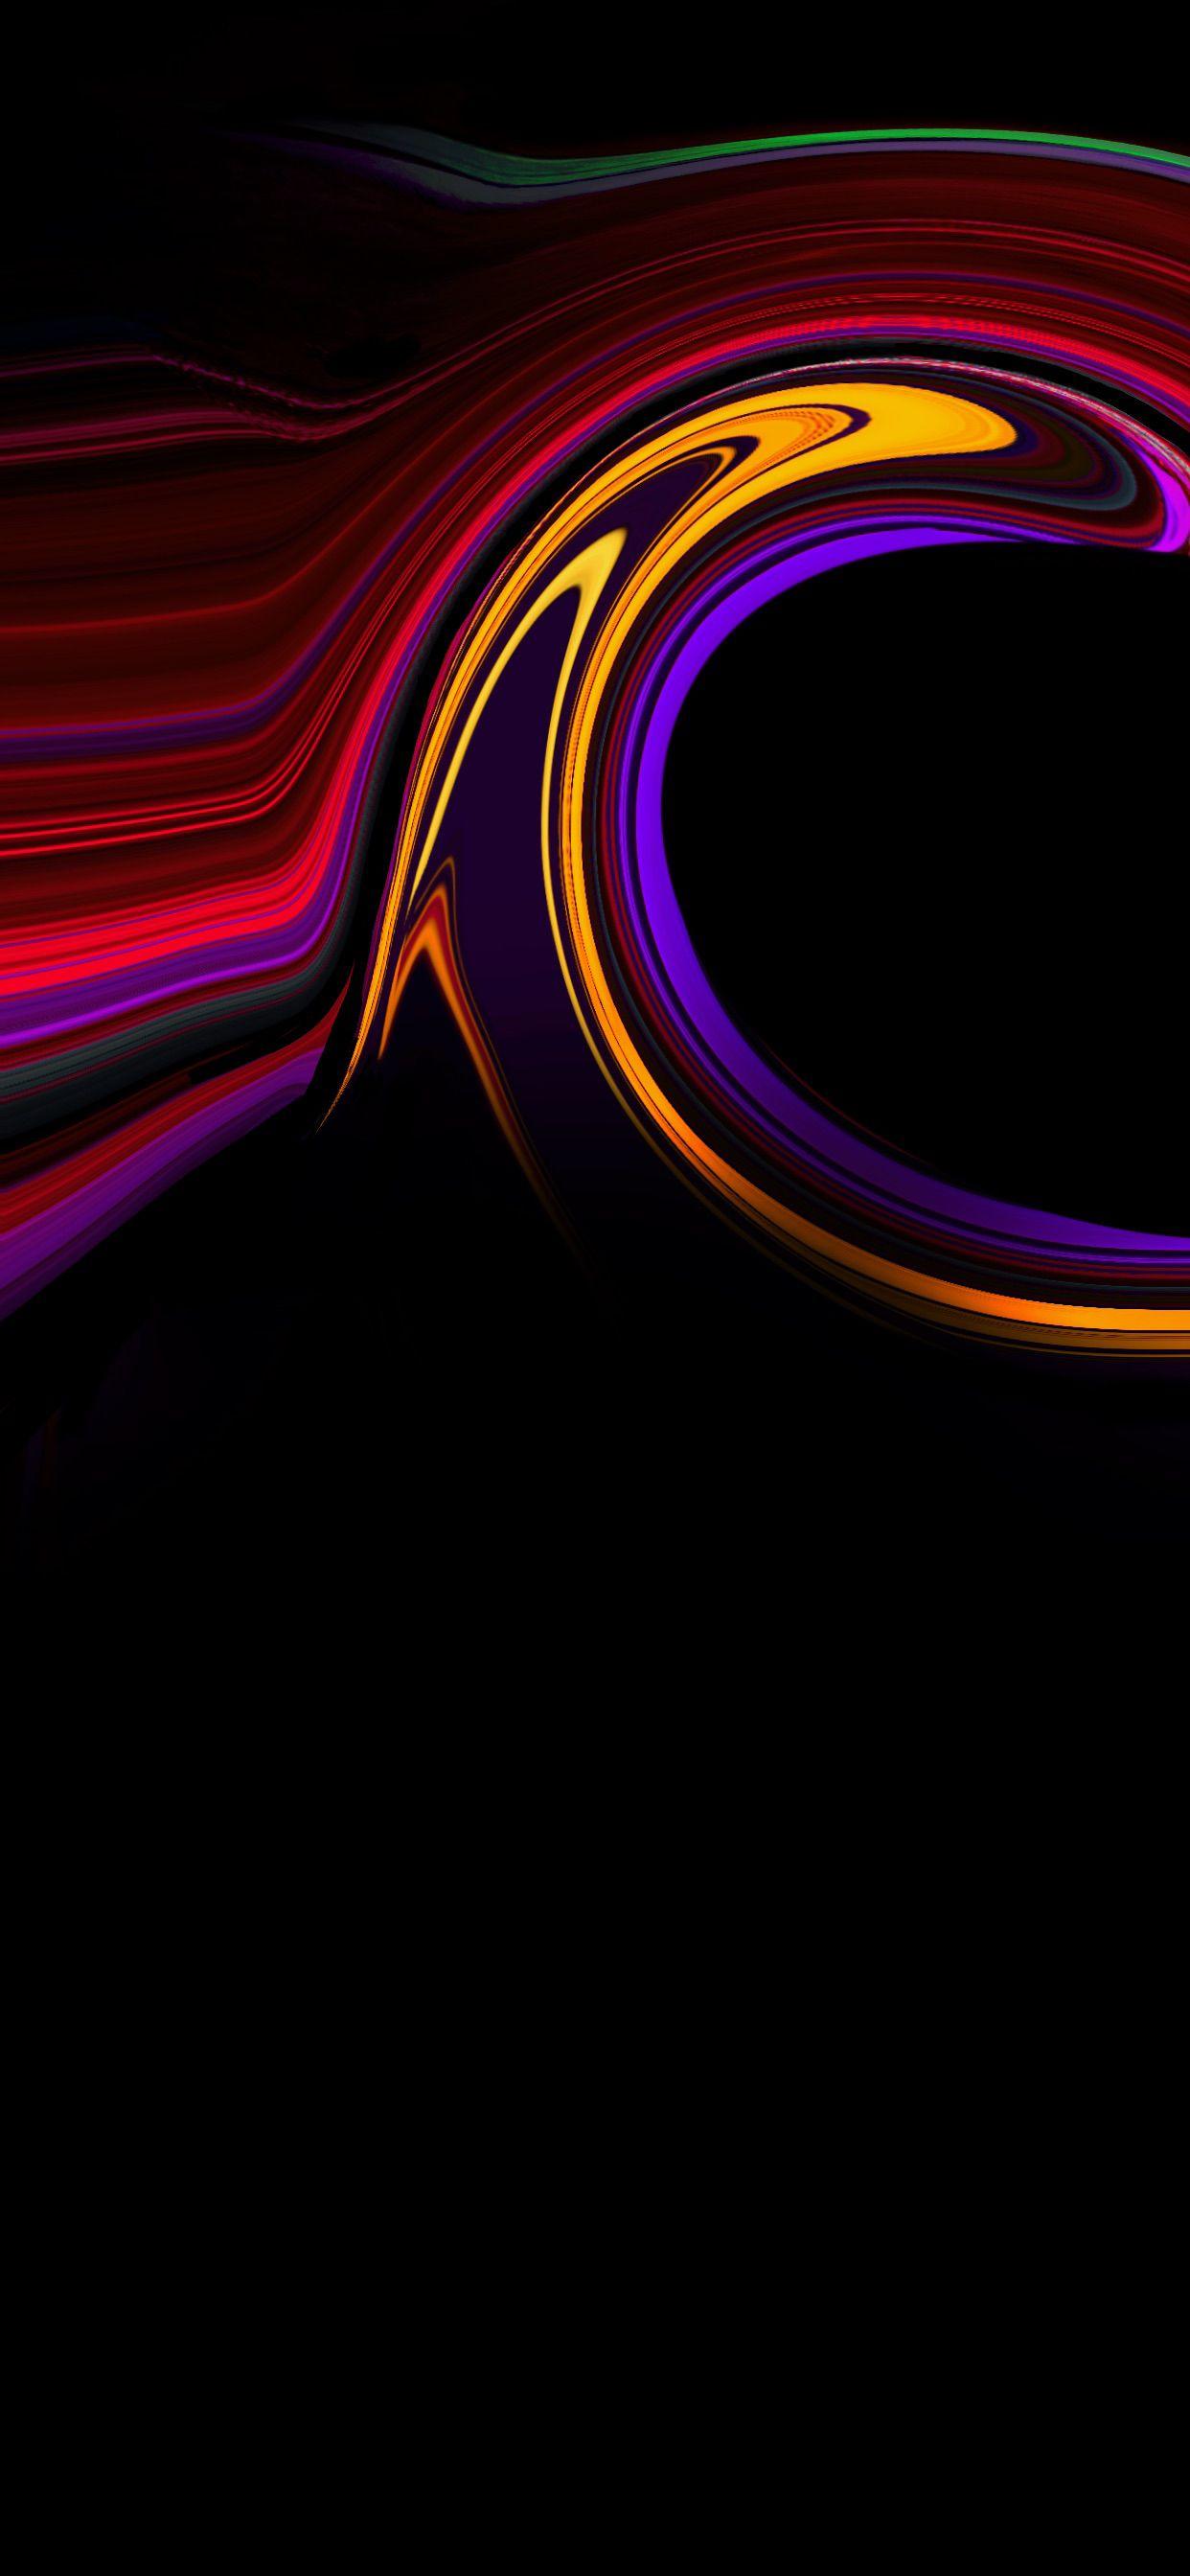 Pin by Satishjain JainS.C on Art abstract Abstract